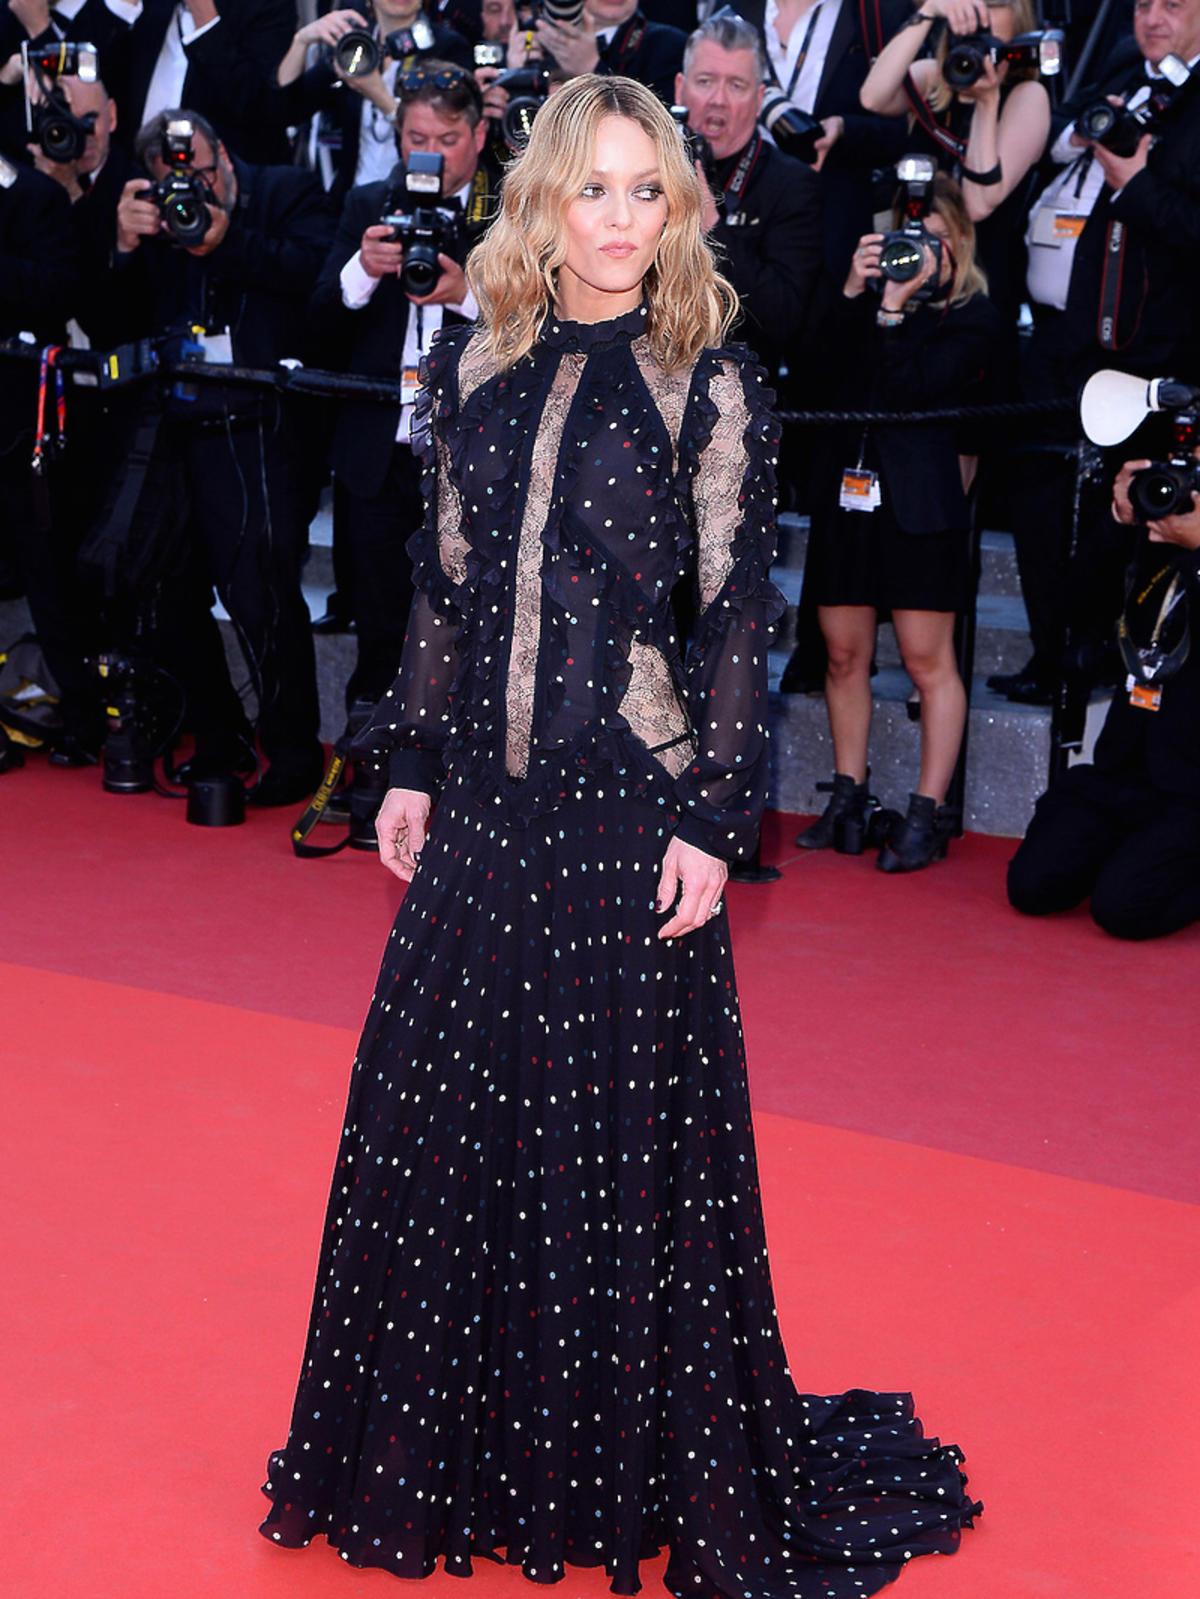 Vanessa Paradis w czarnej sukience